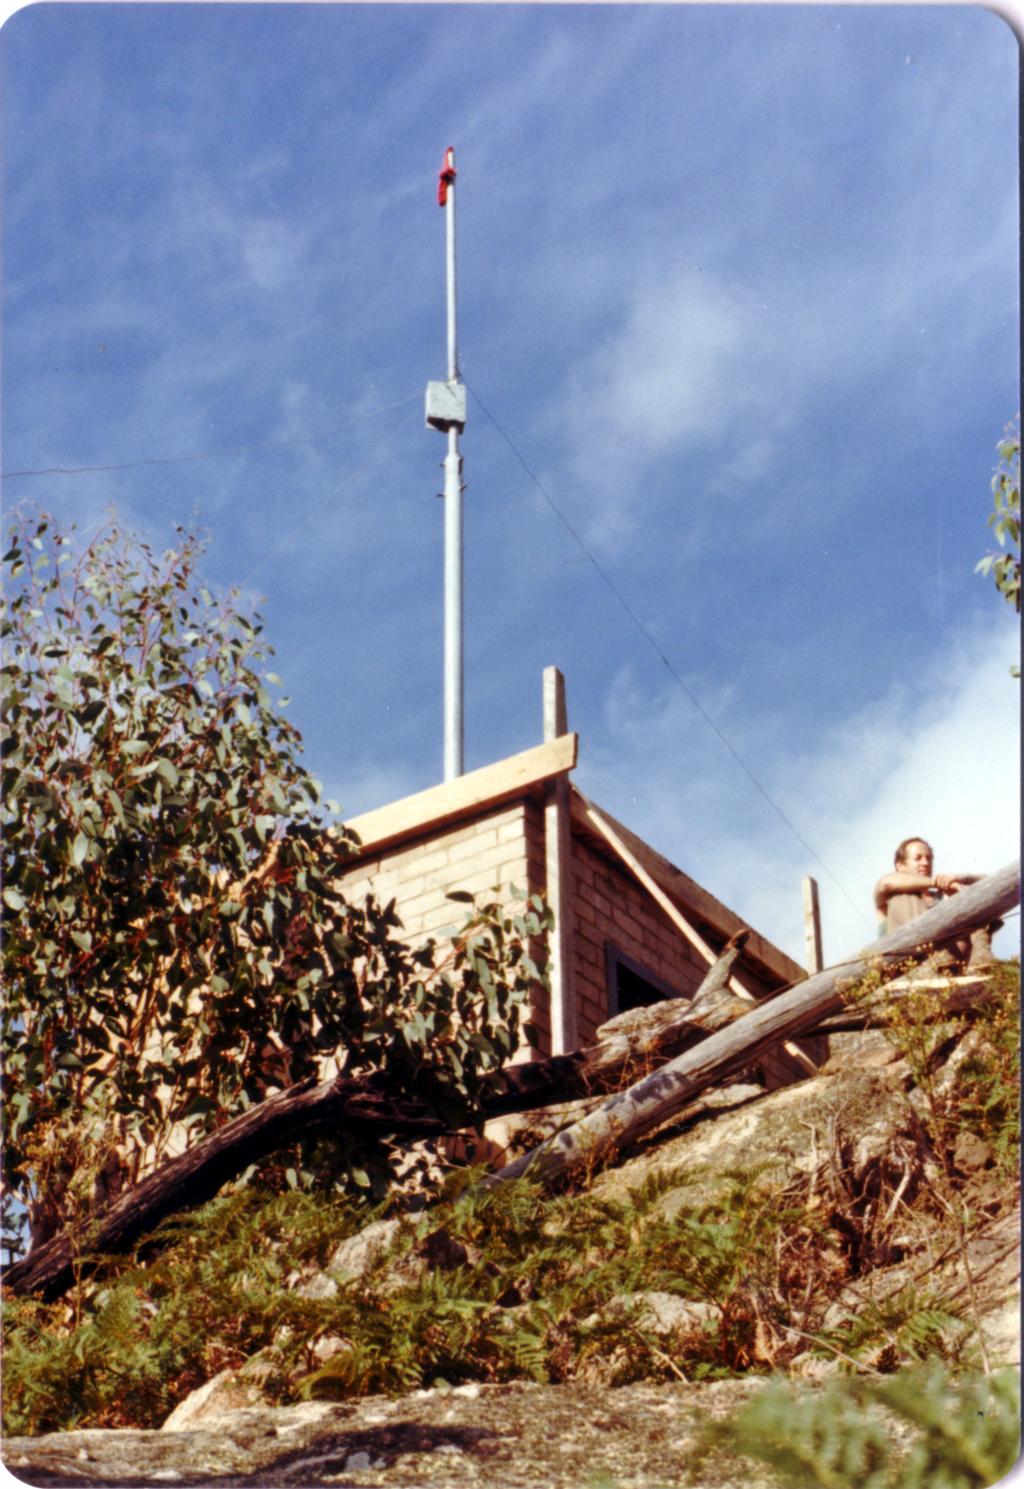 1982-04-18 RGV Construction VK3YMG-Doug Johnson